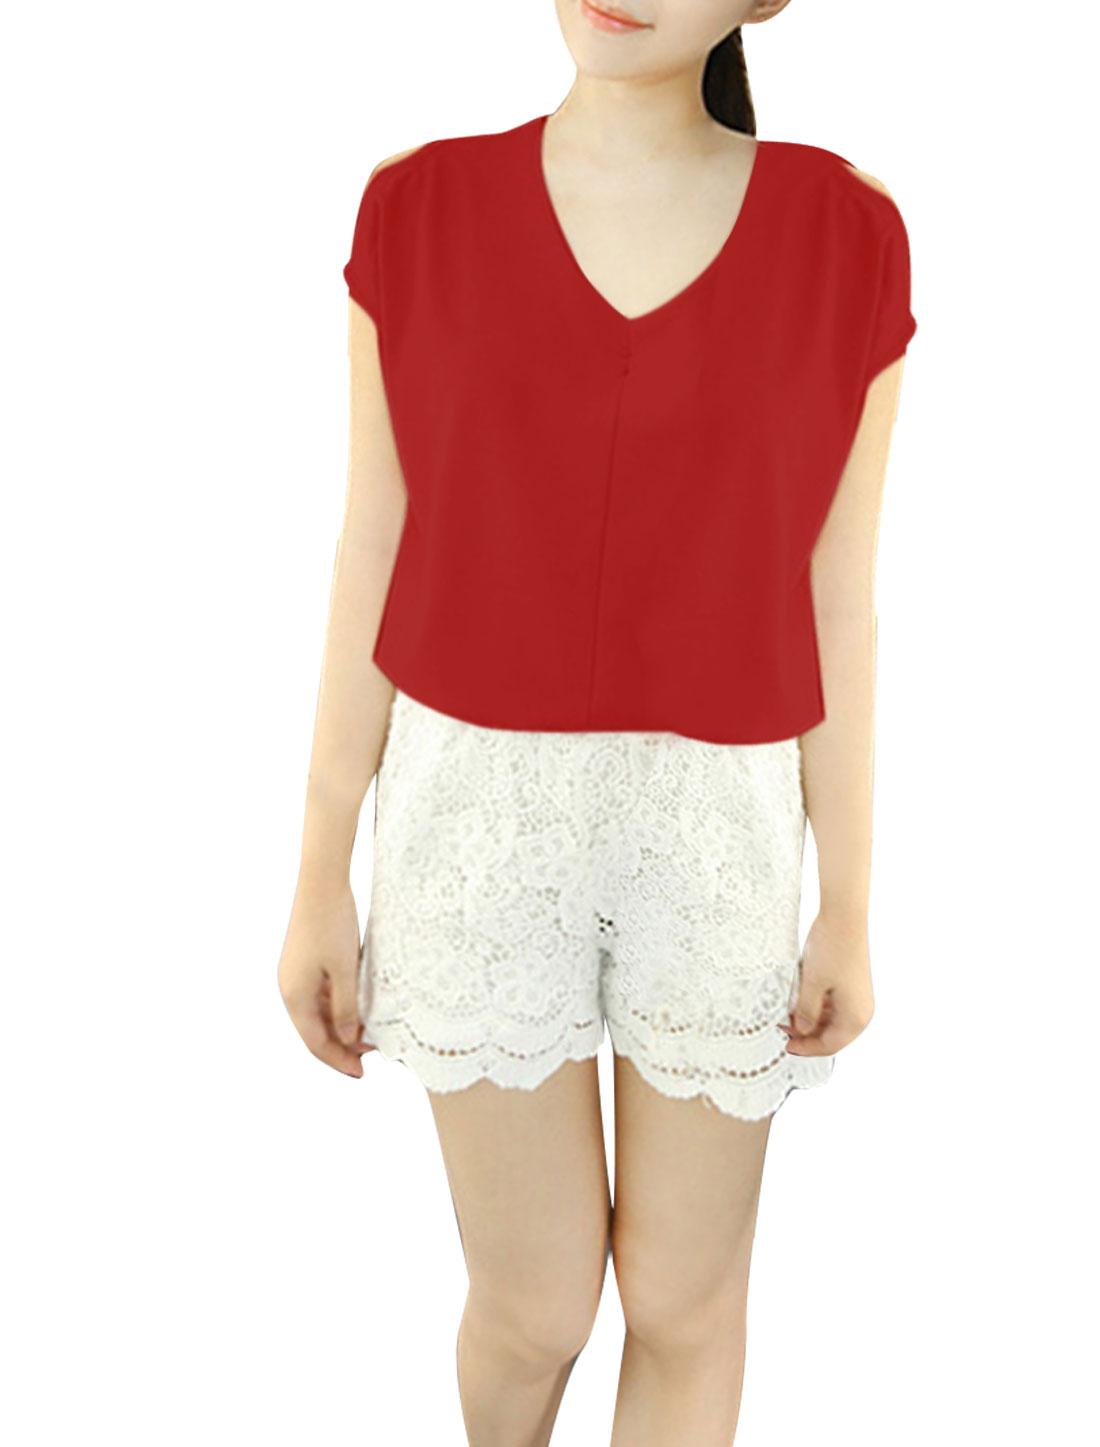 Women Deep V Neck Cut Out Semi Sheer Top Shirt Red S